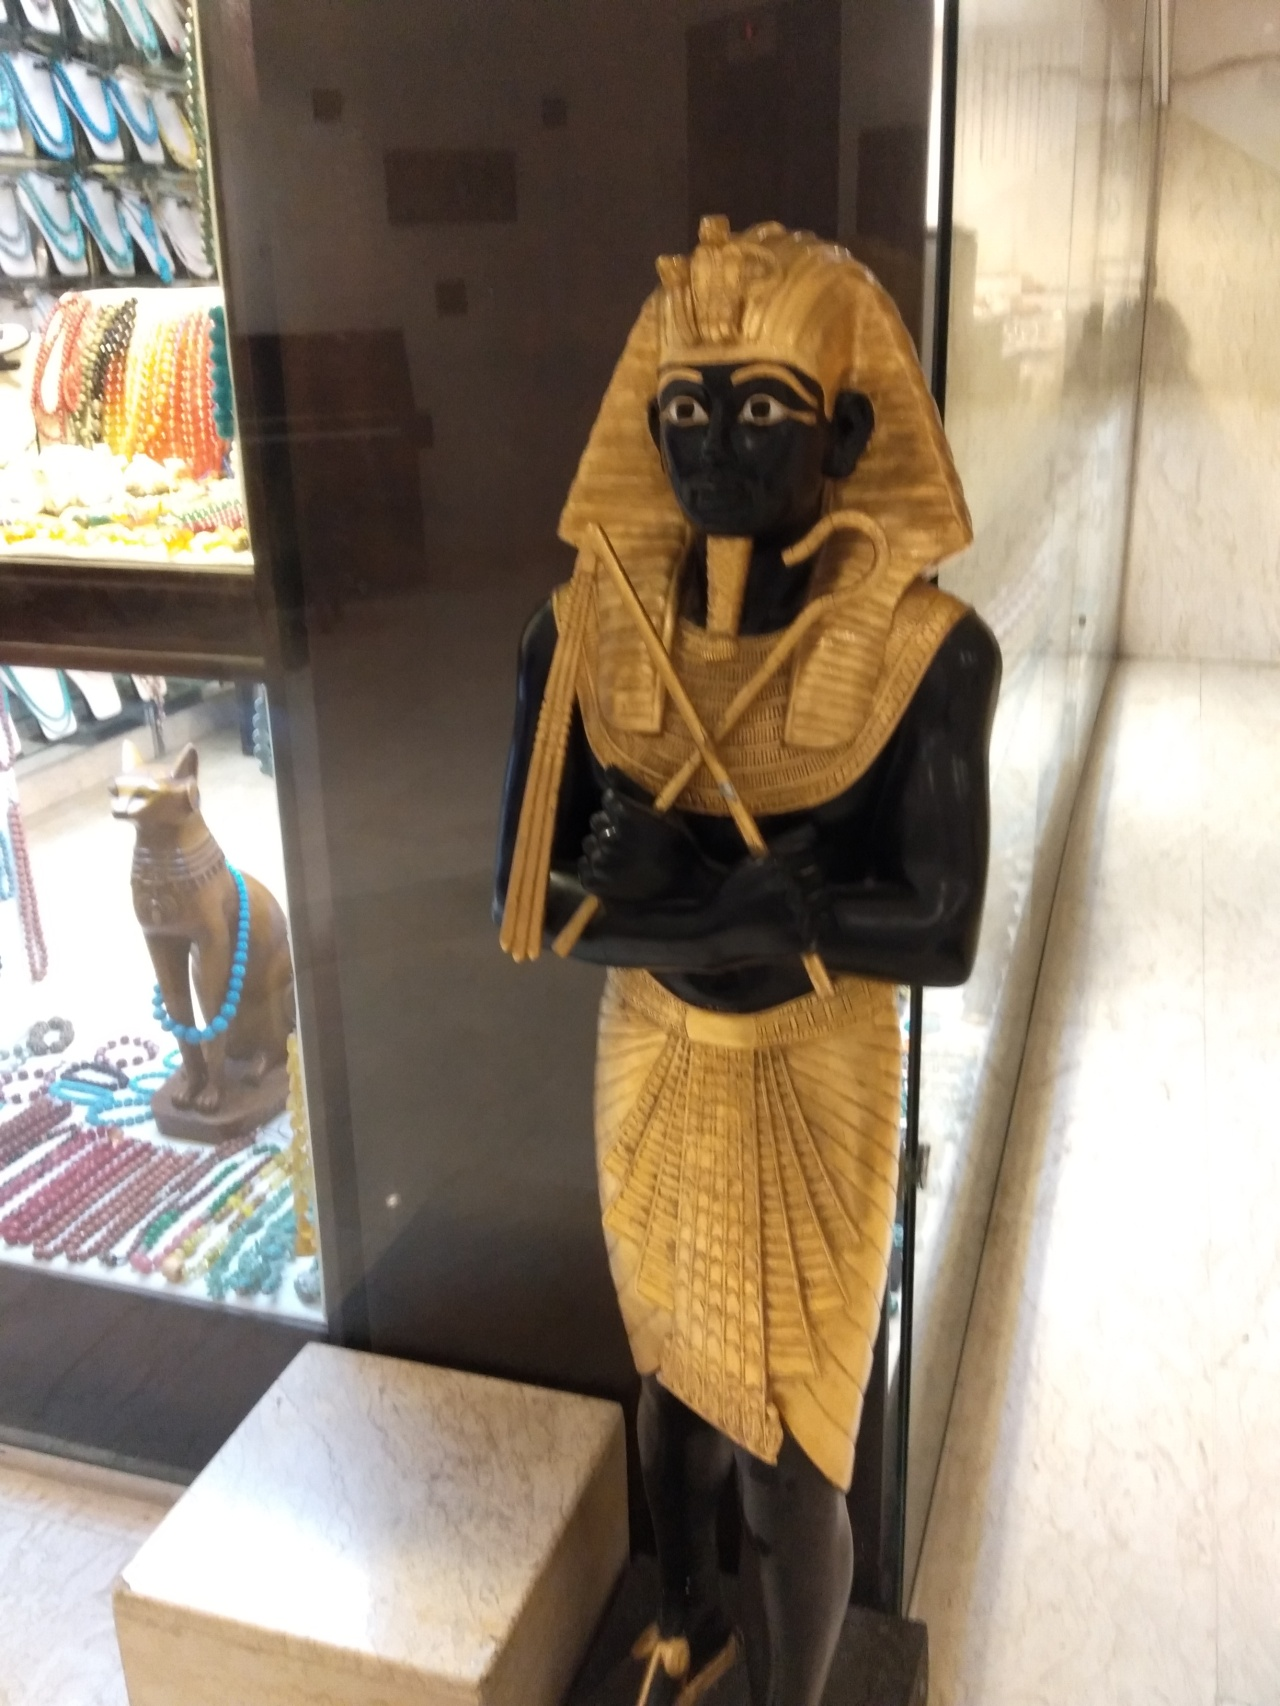 EGYPT TRIP (Part2)